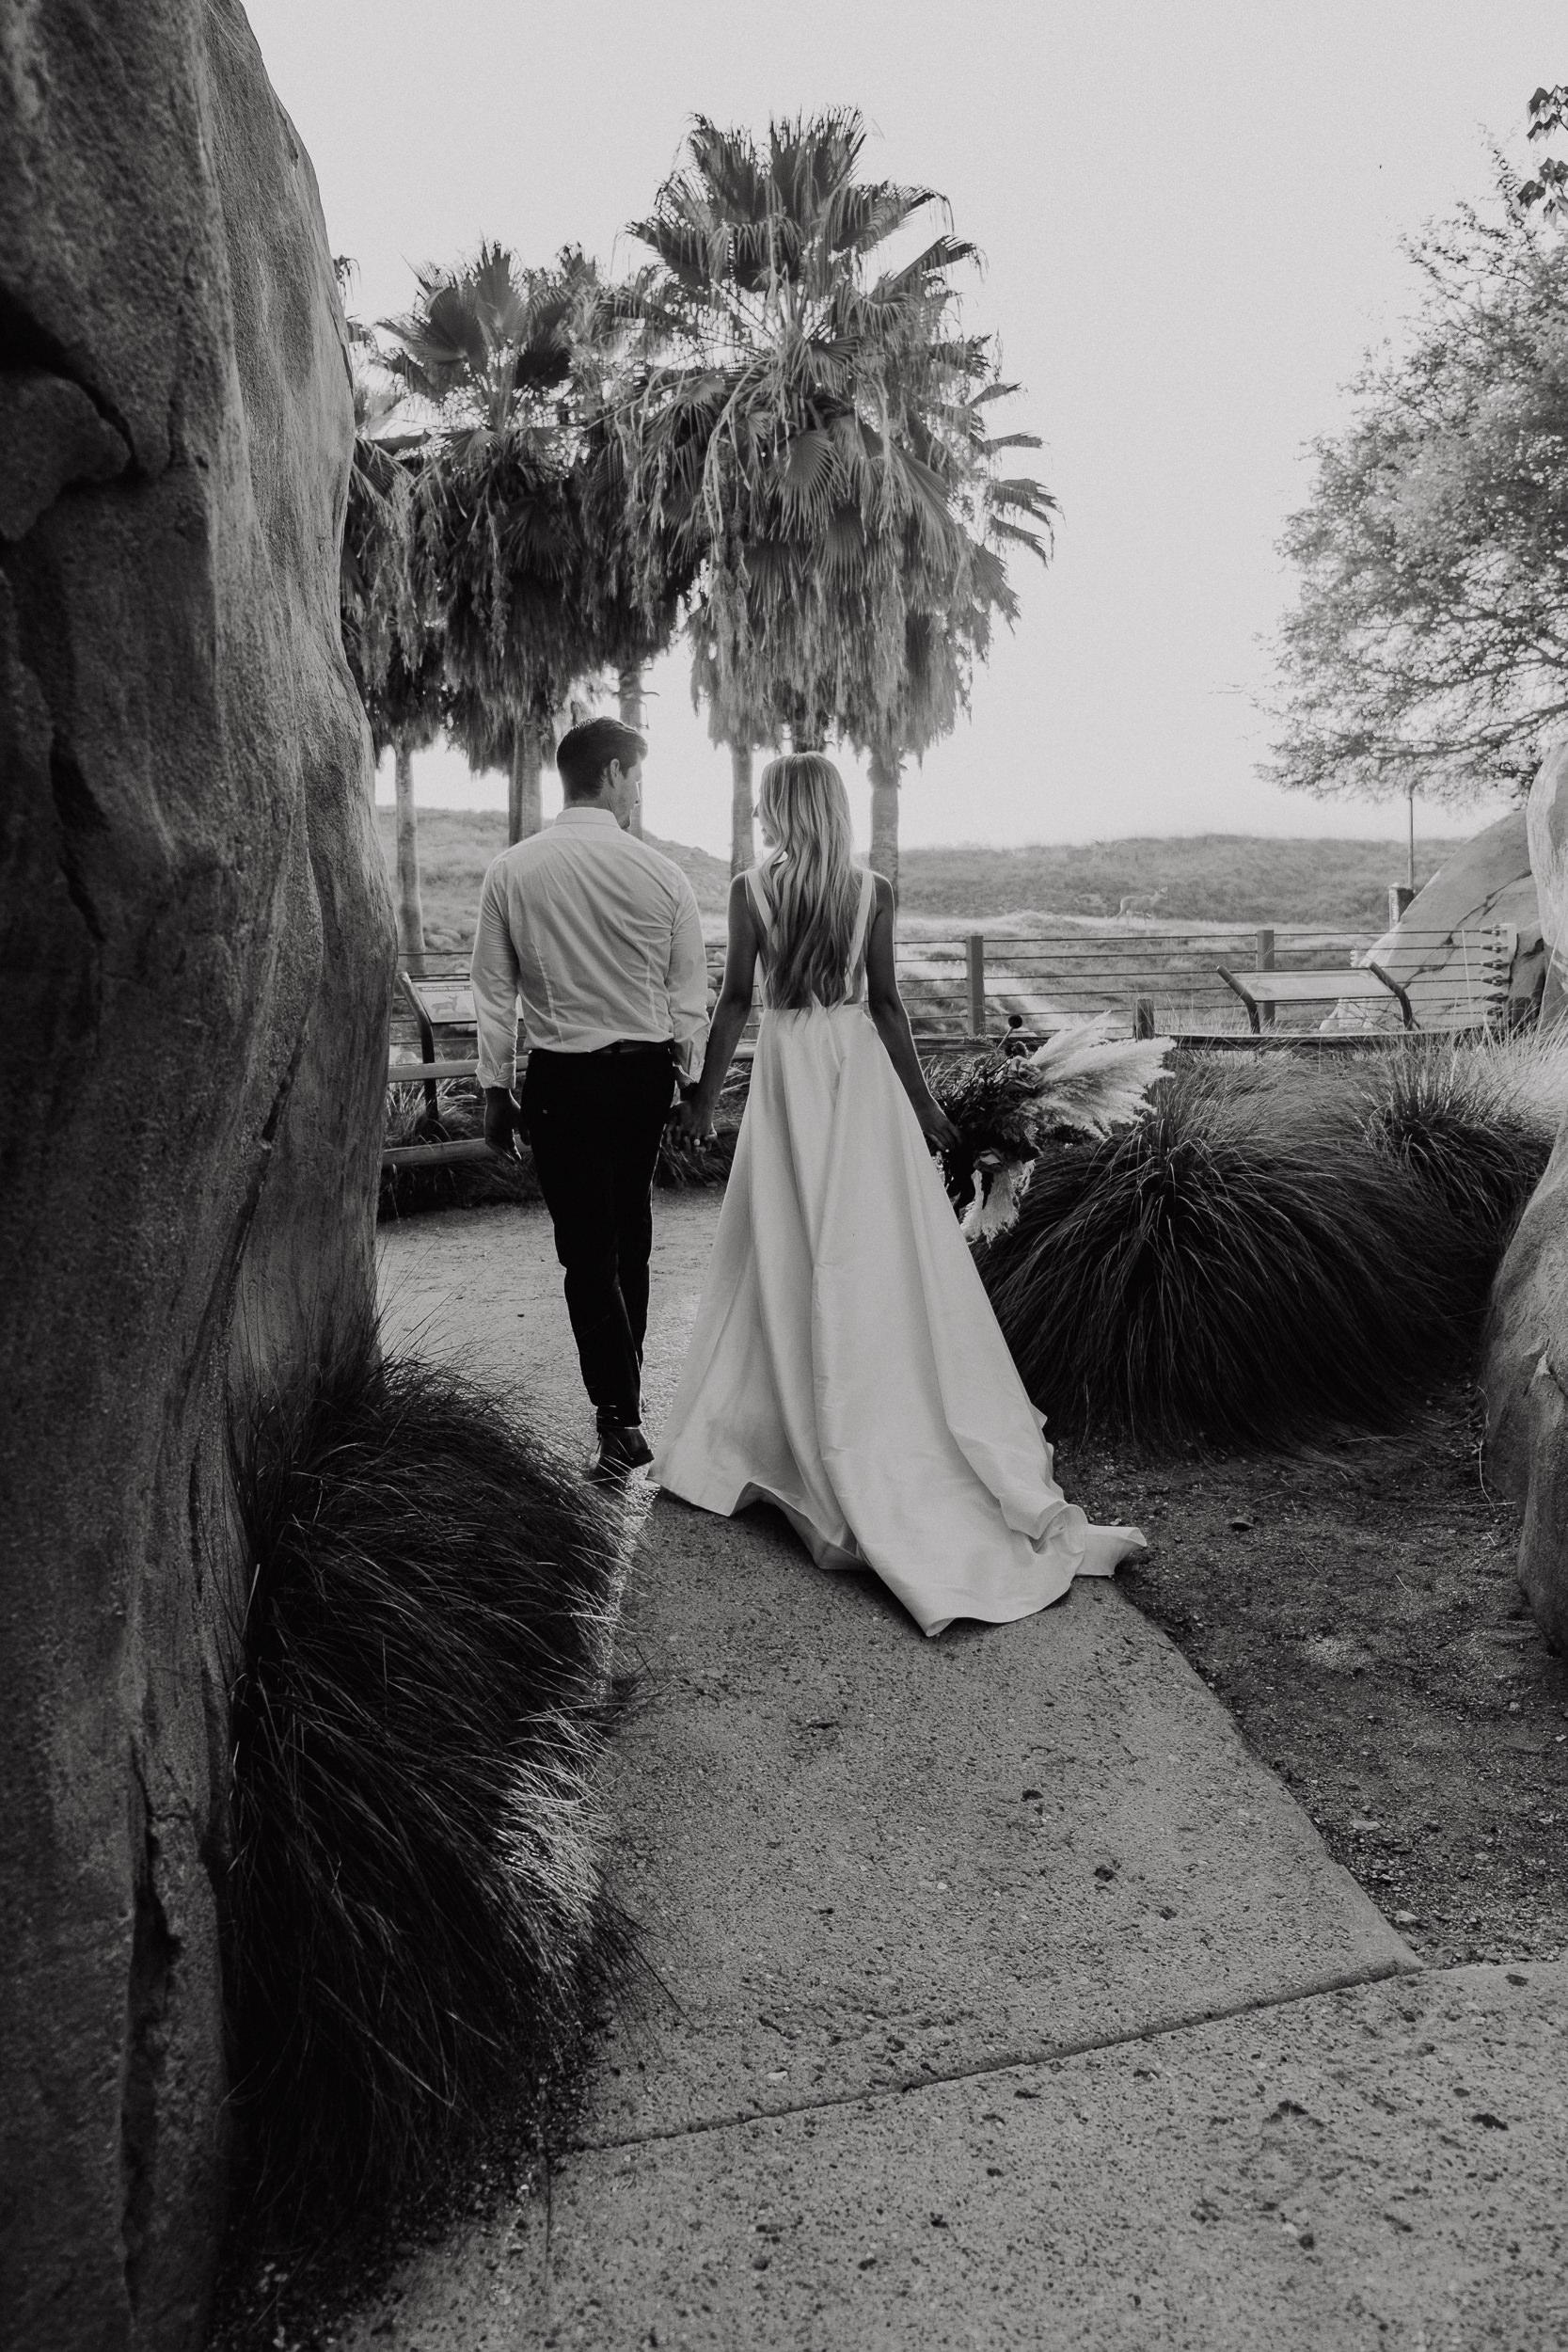 sChelsie + Chris - The Desert Shootout Wedding Romantics at The Living Desert-27.jpg